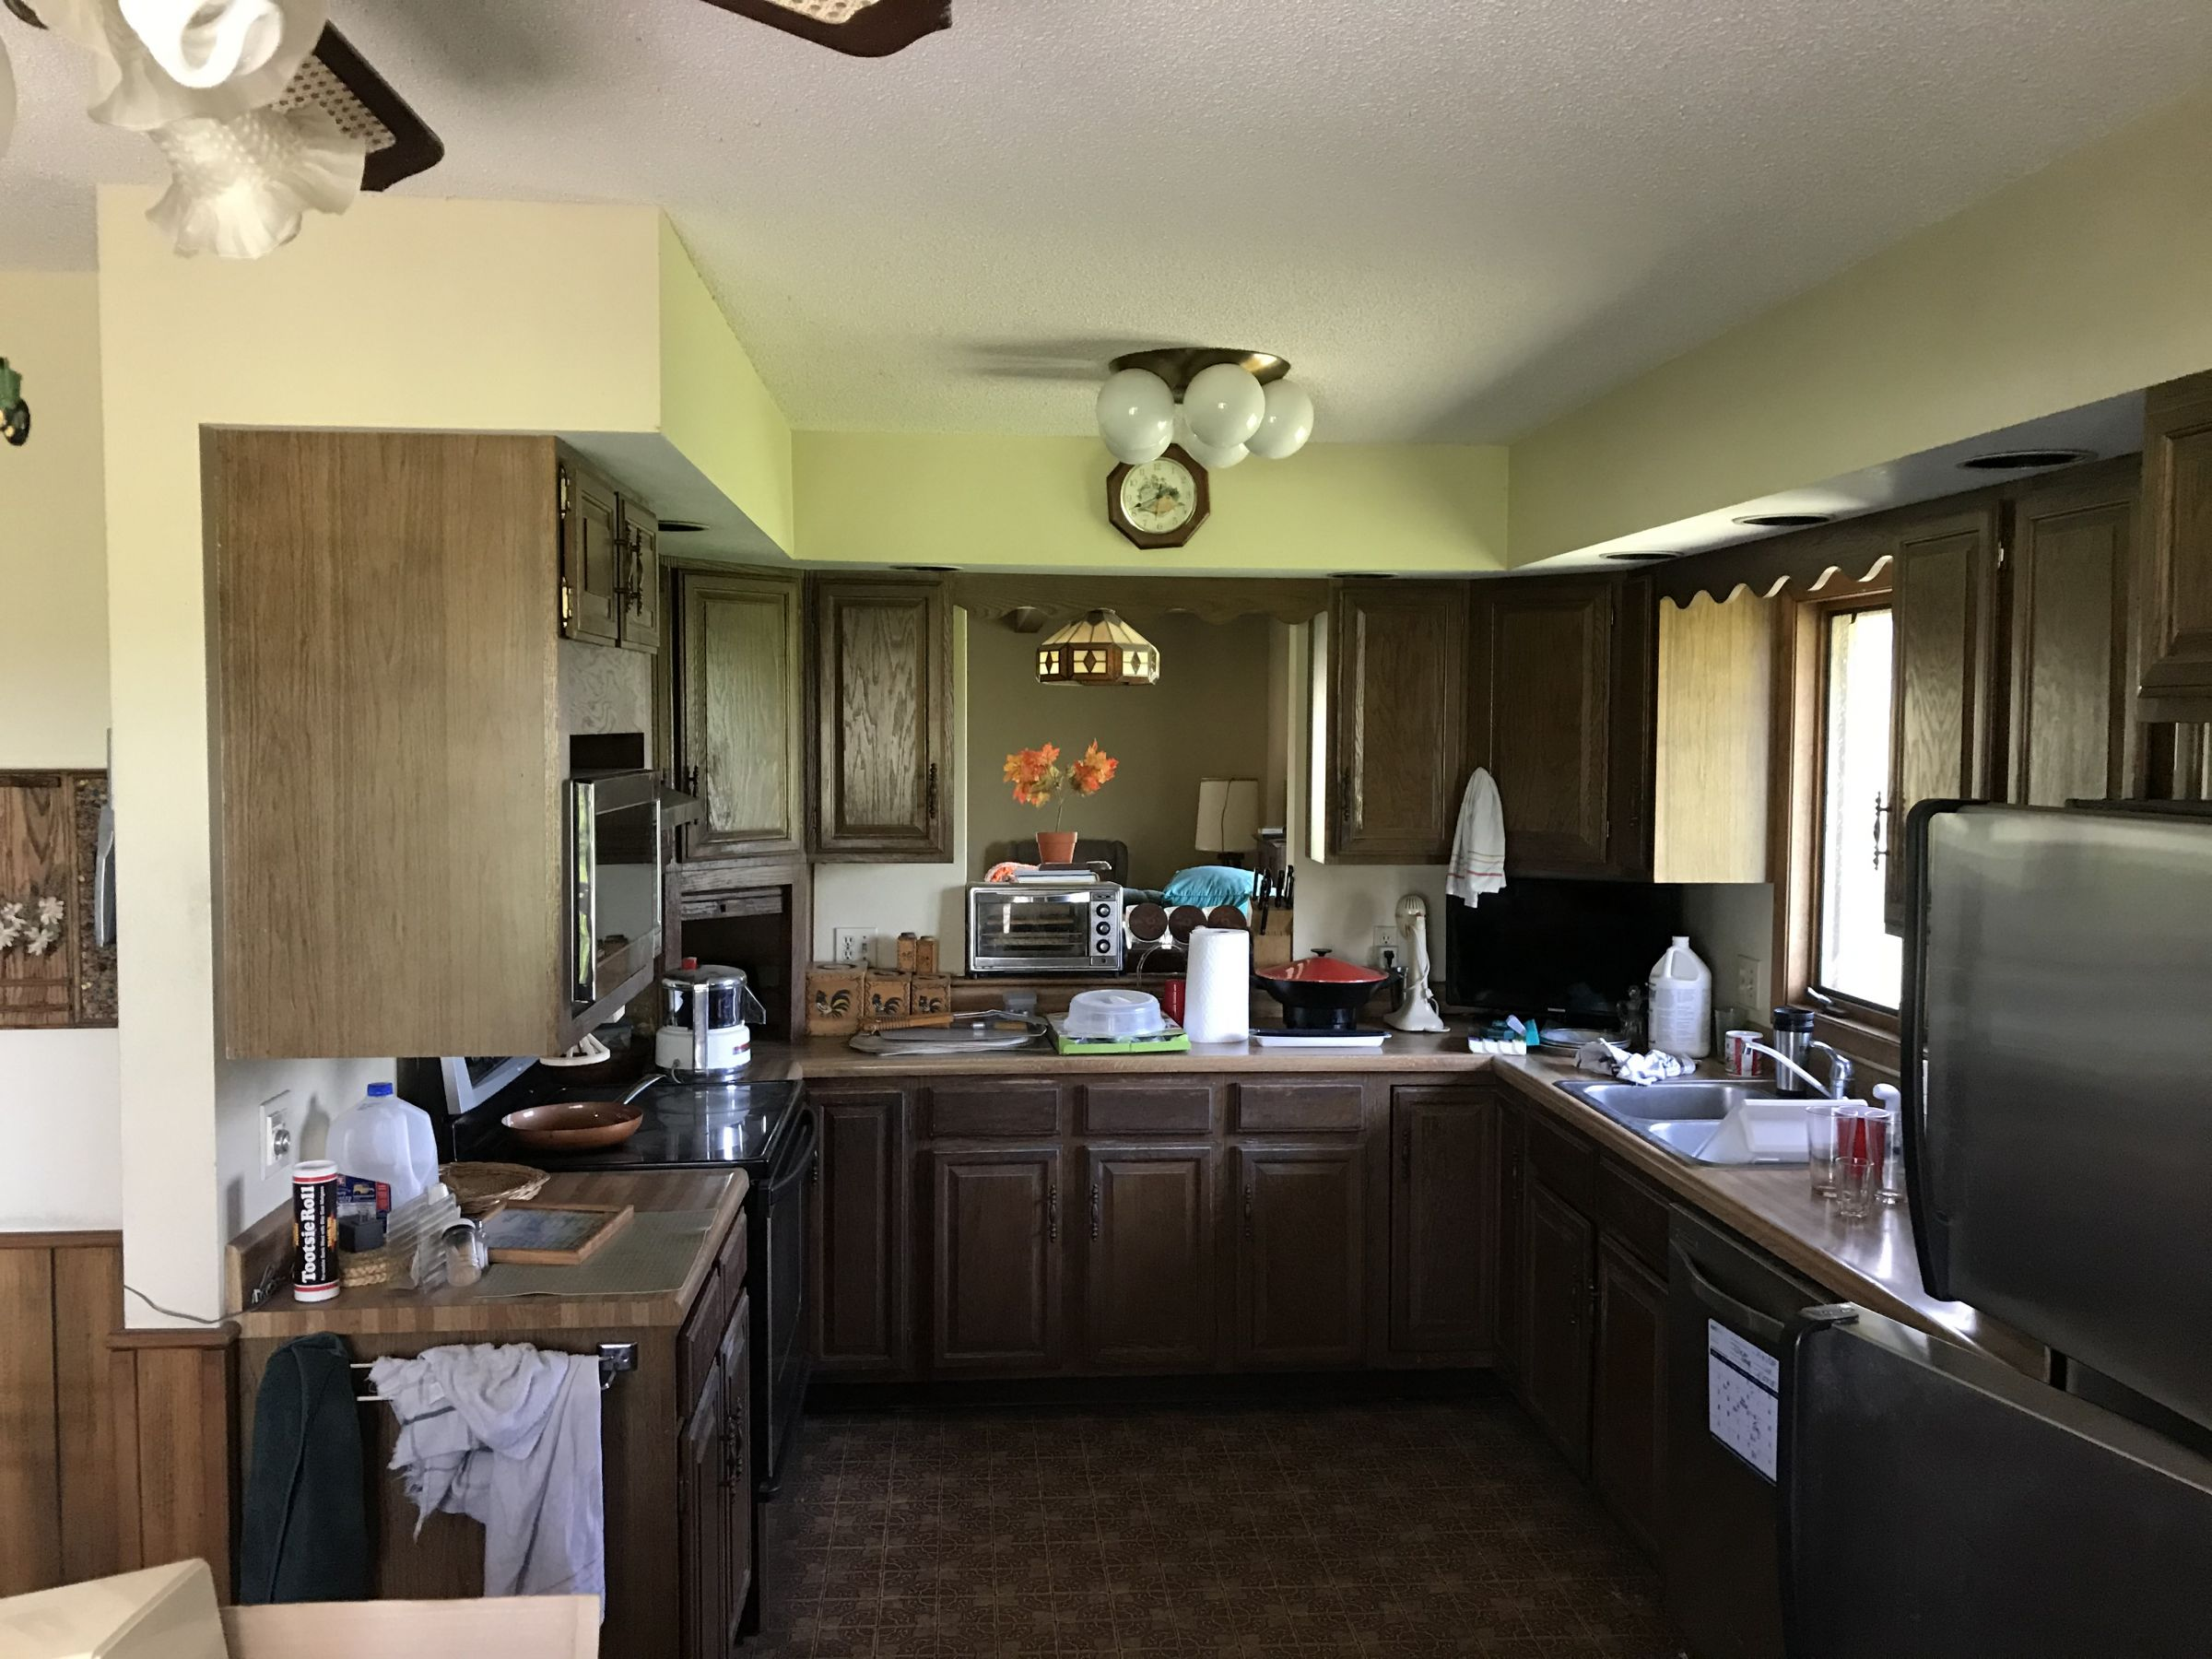 residential-polk-county-iowa-34-acres-listing-number-15502-6-2021-04-29-144021.jpg